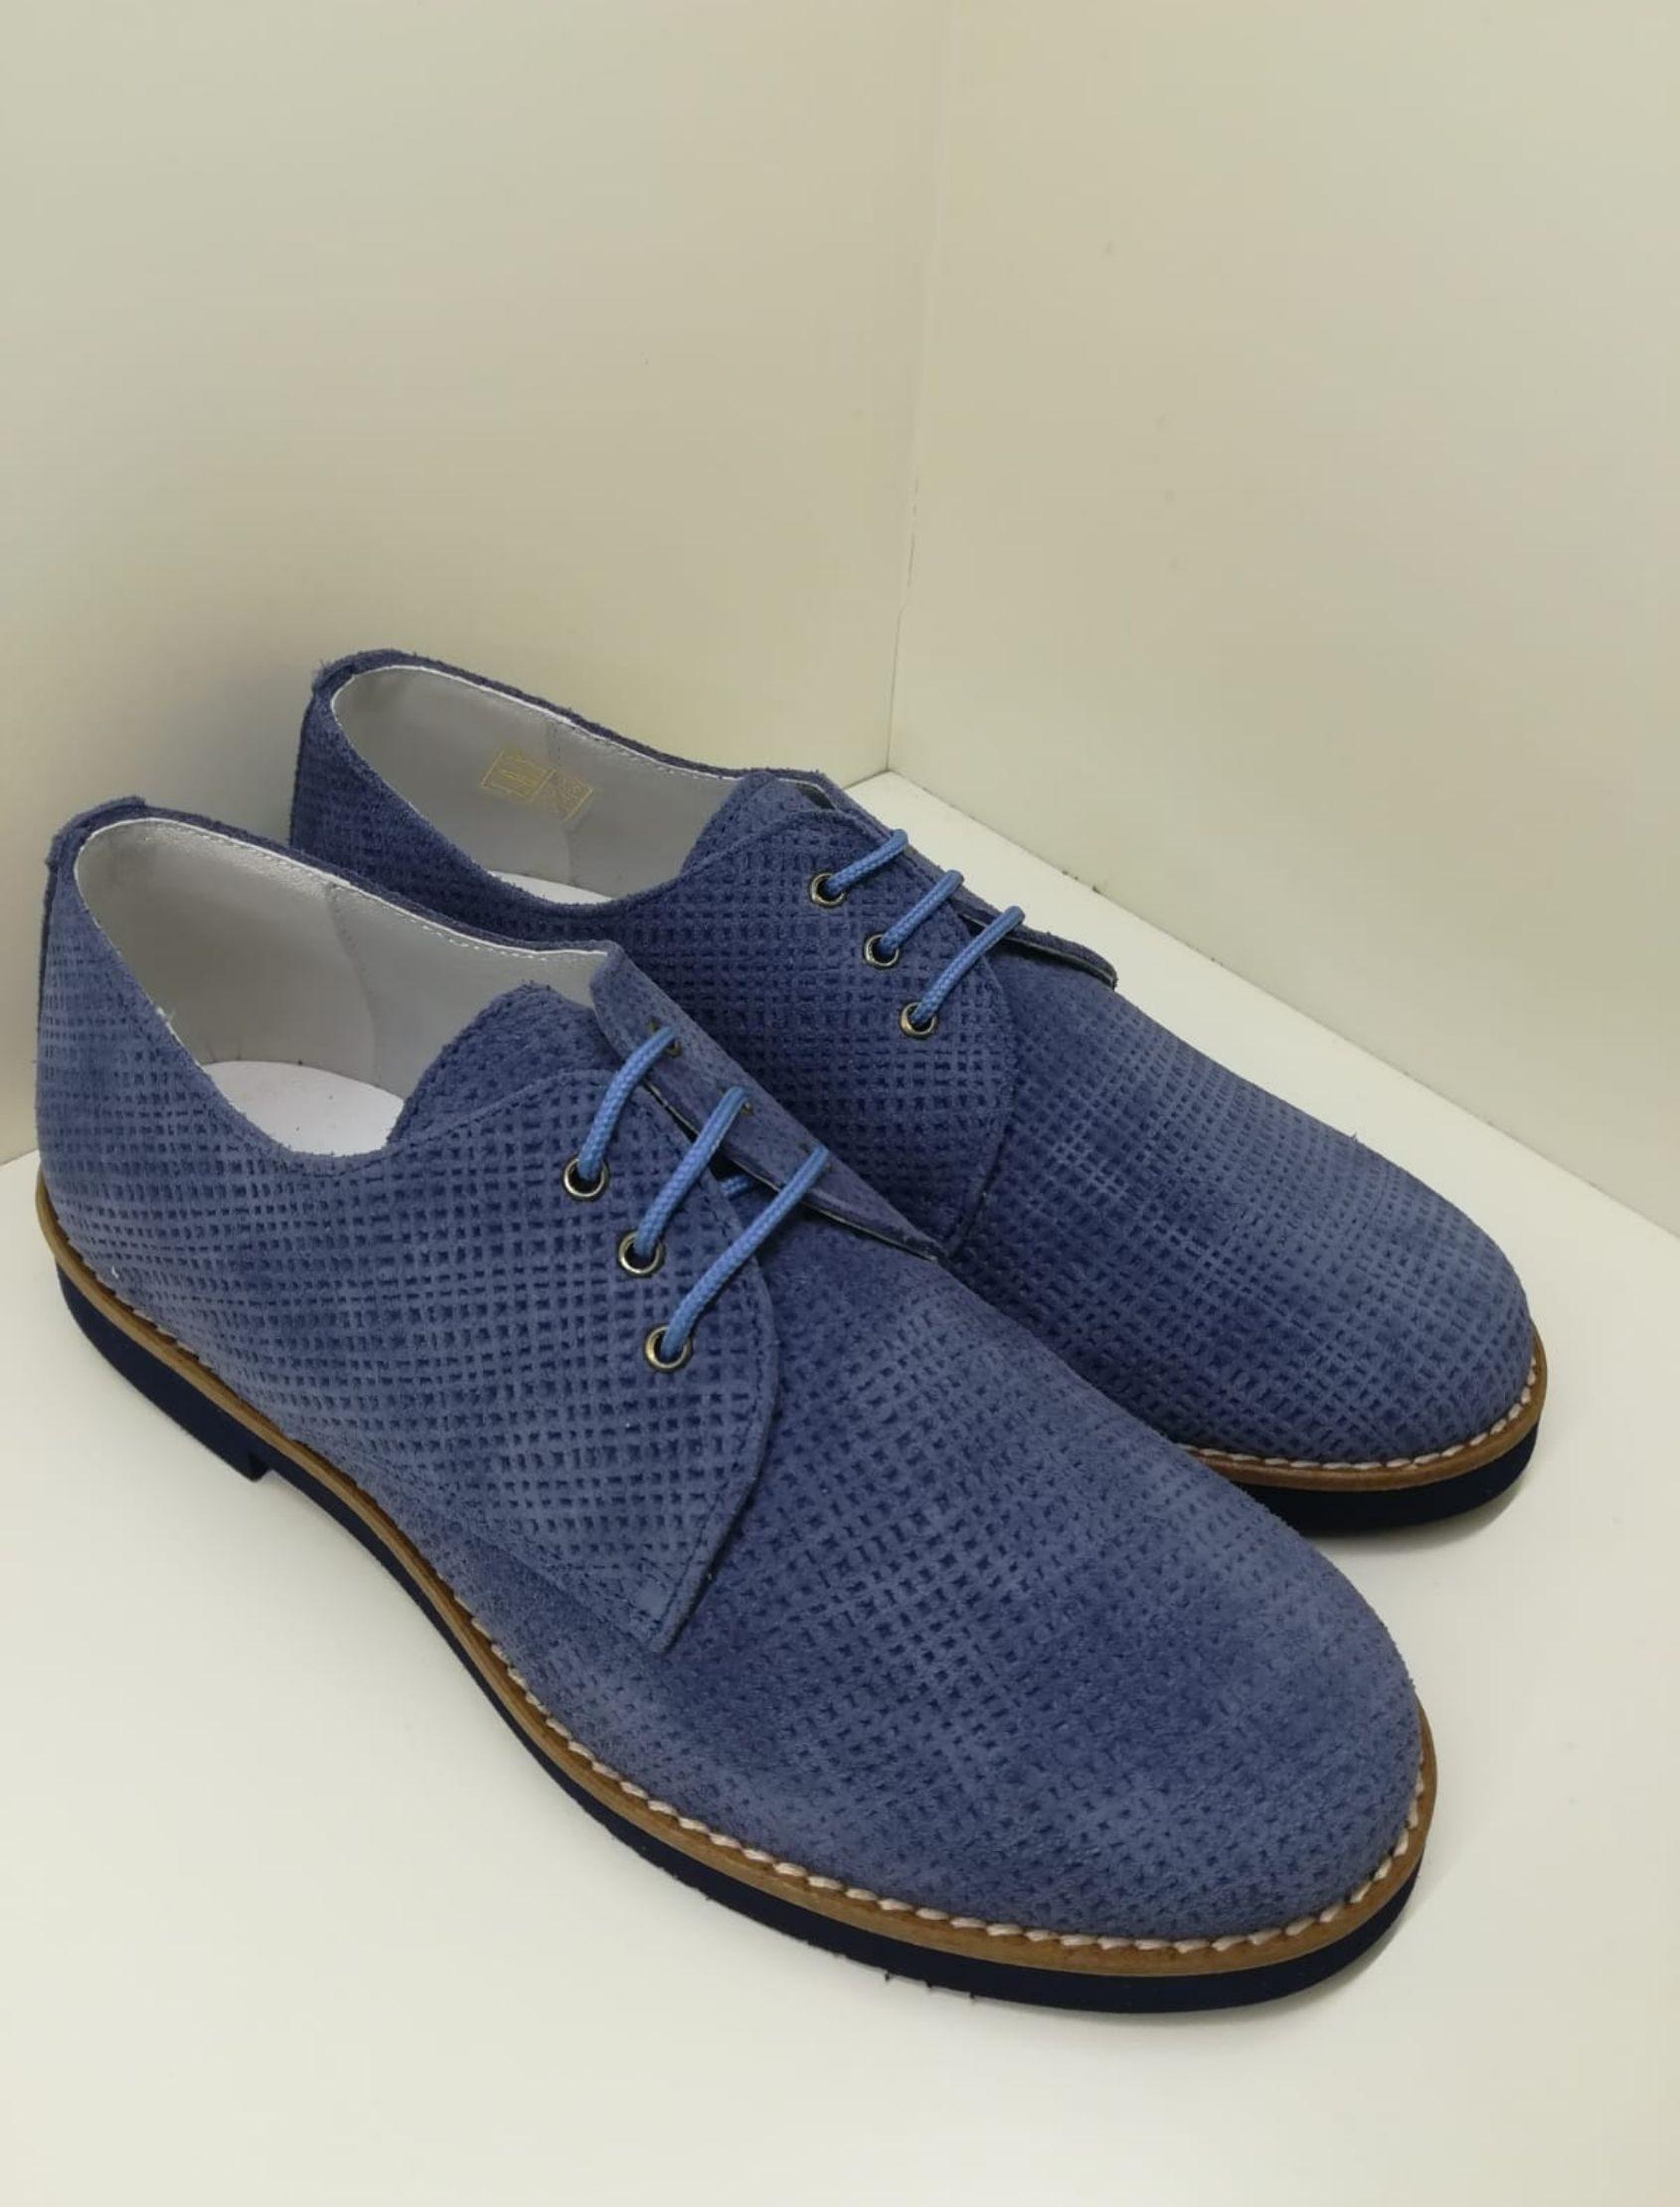 zapato tipo blucher con cordones en piel serraje azul jeans